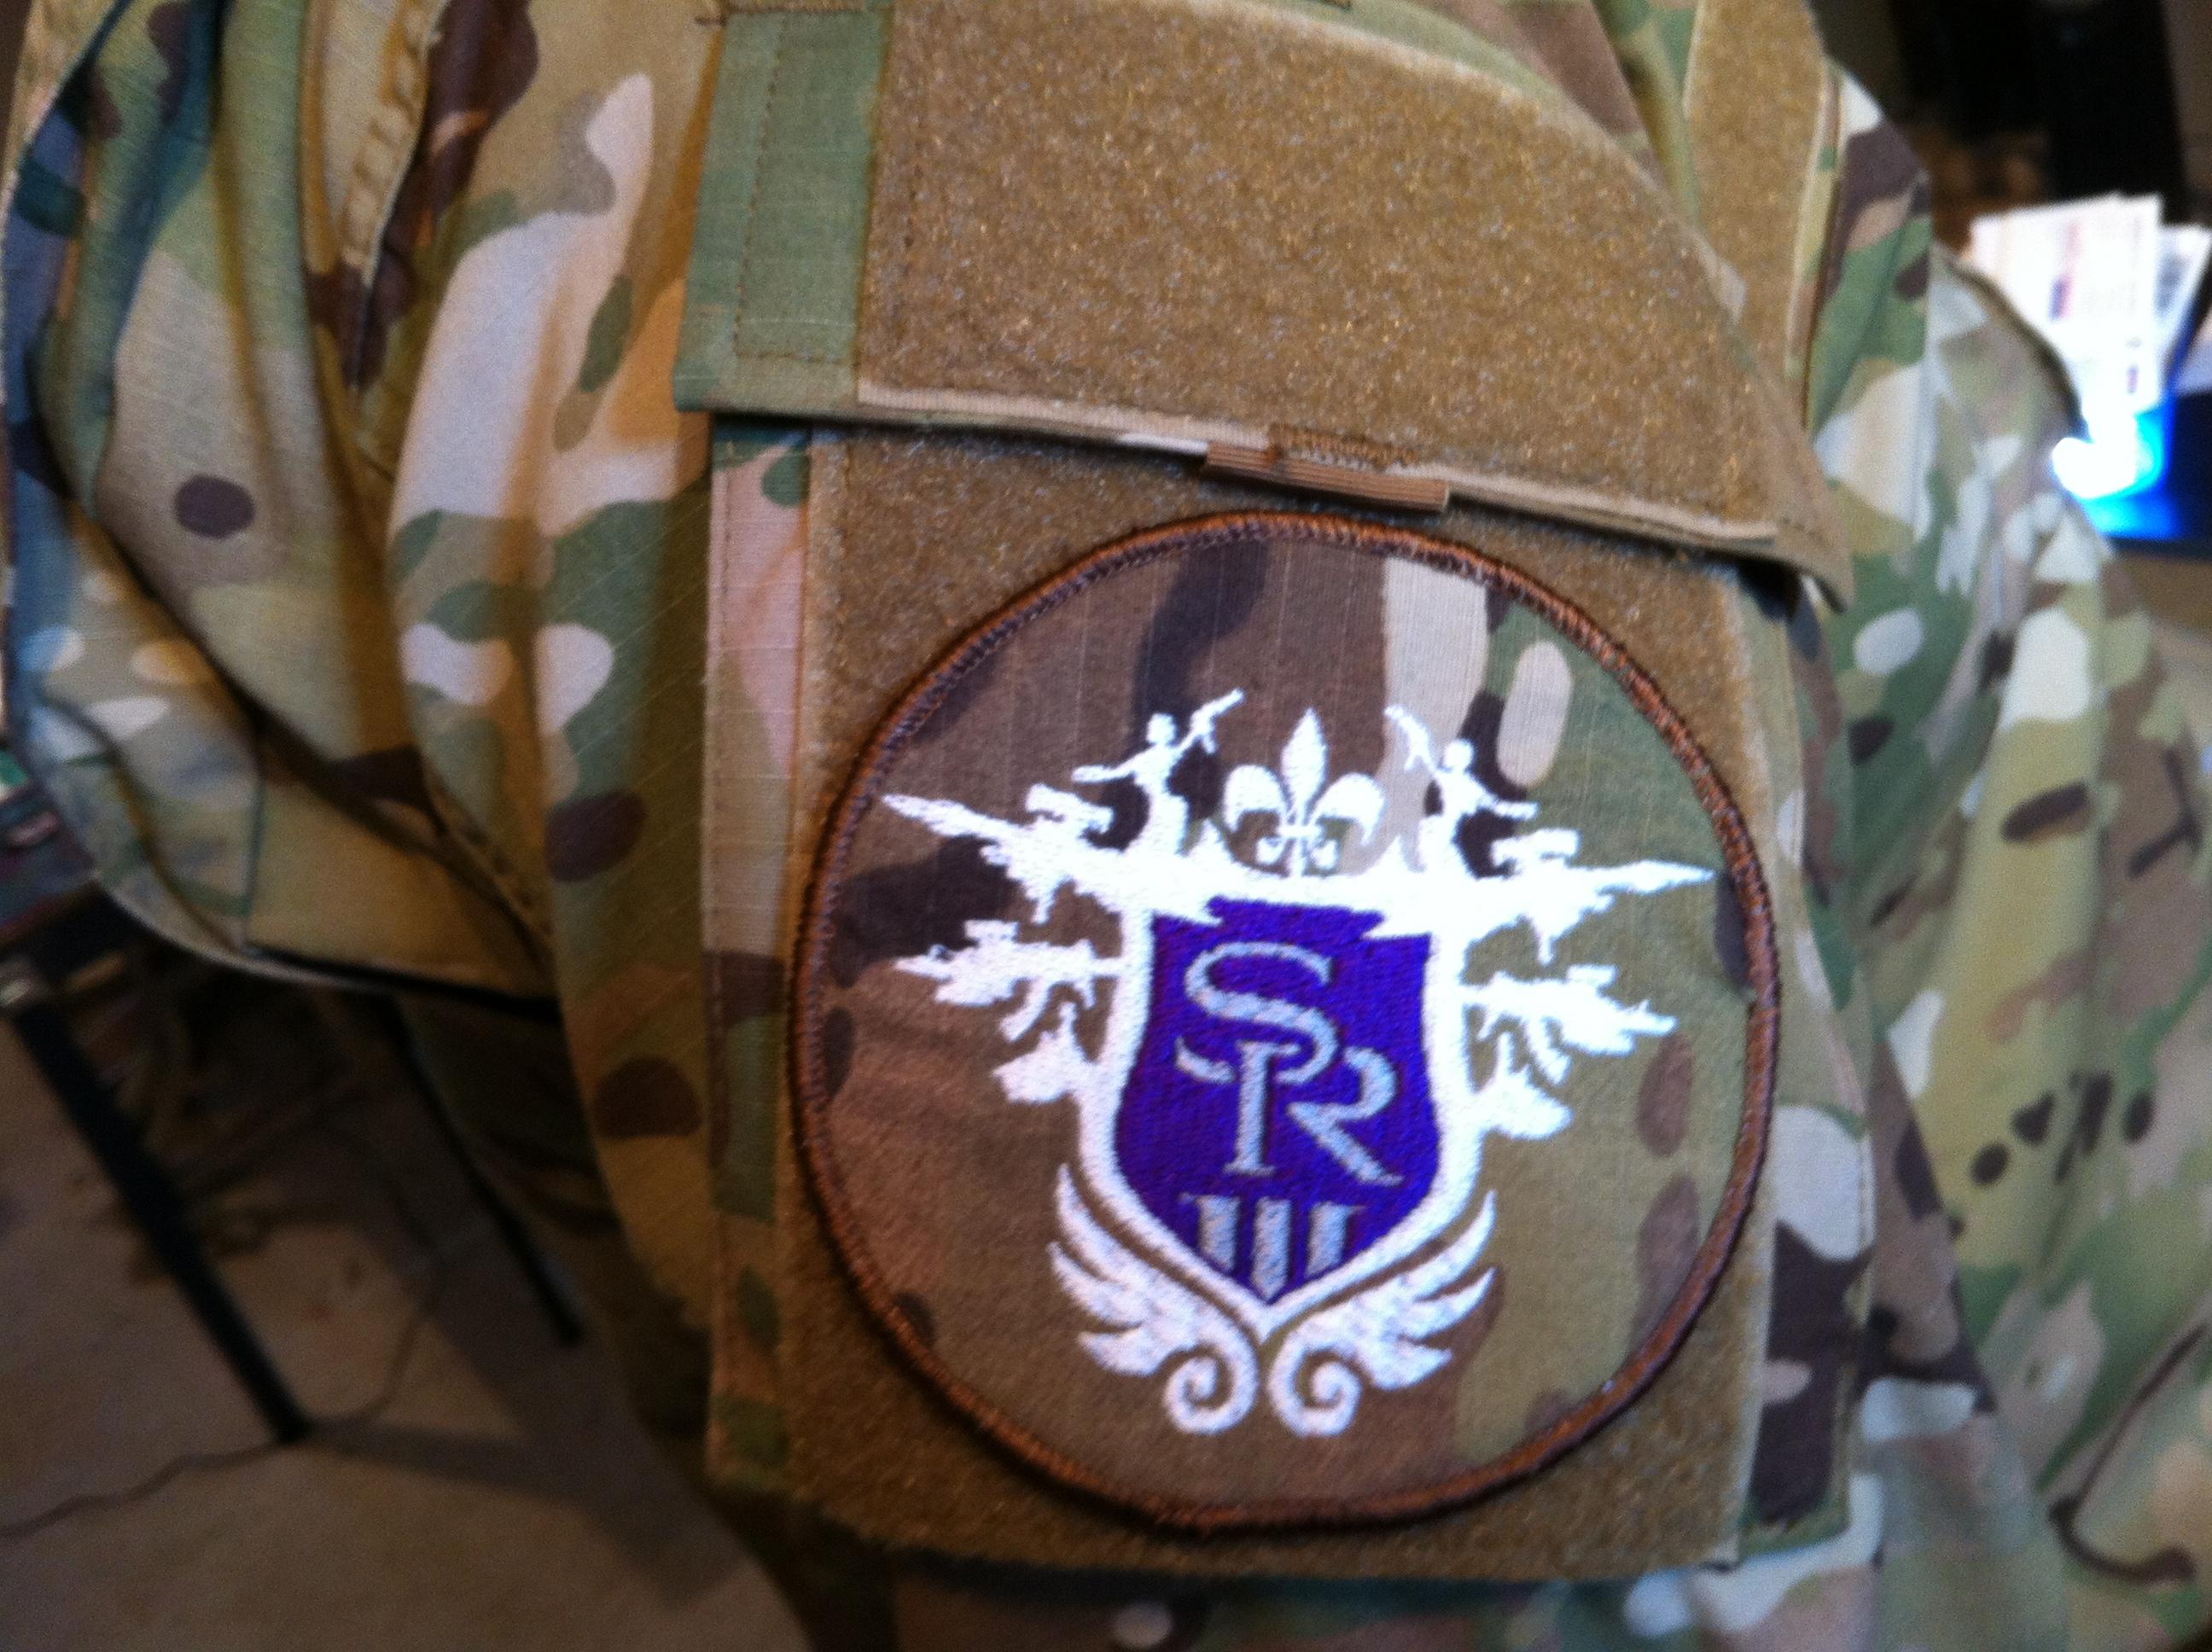 saints row tactical gear pic.jpg